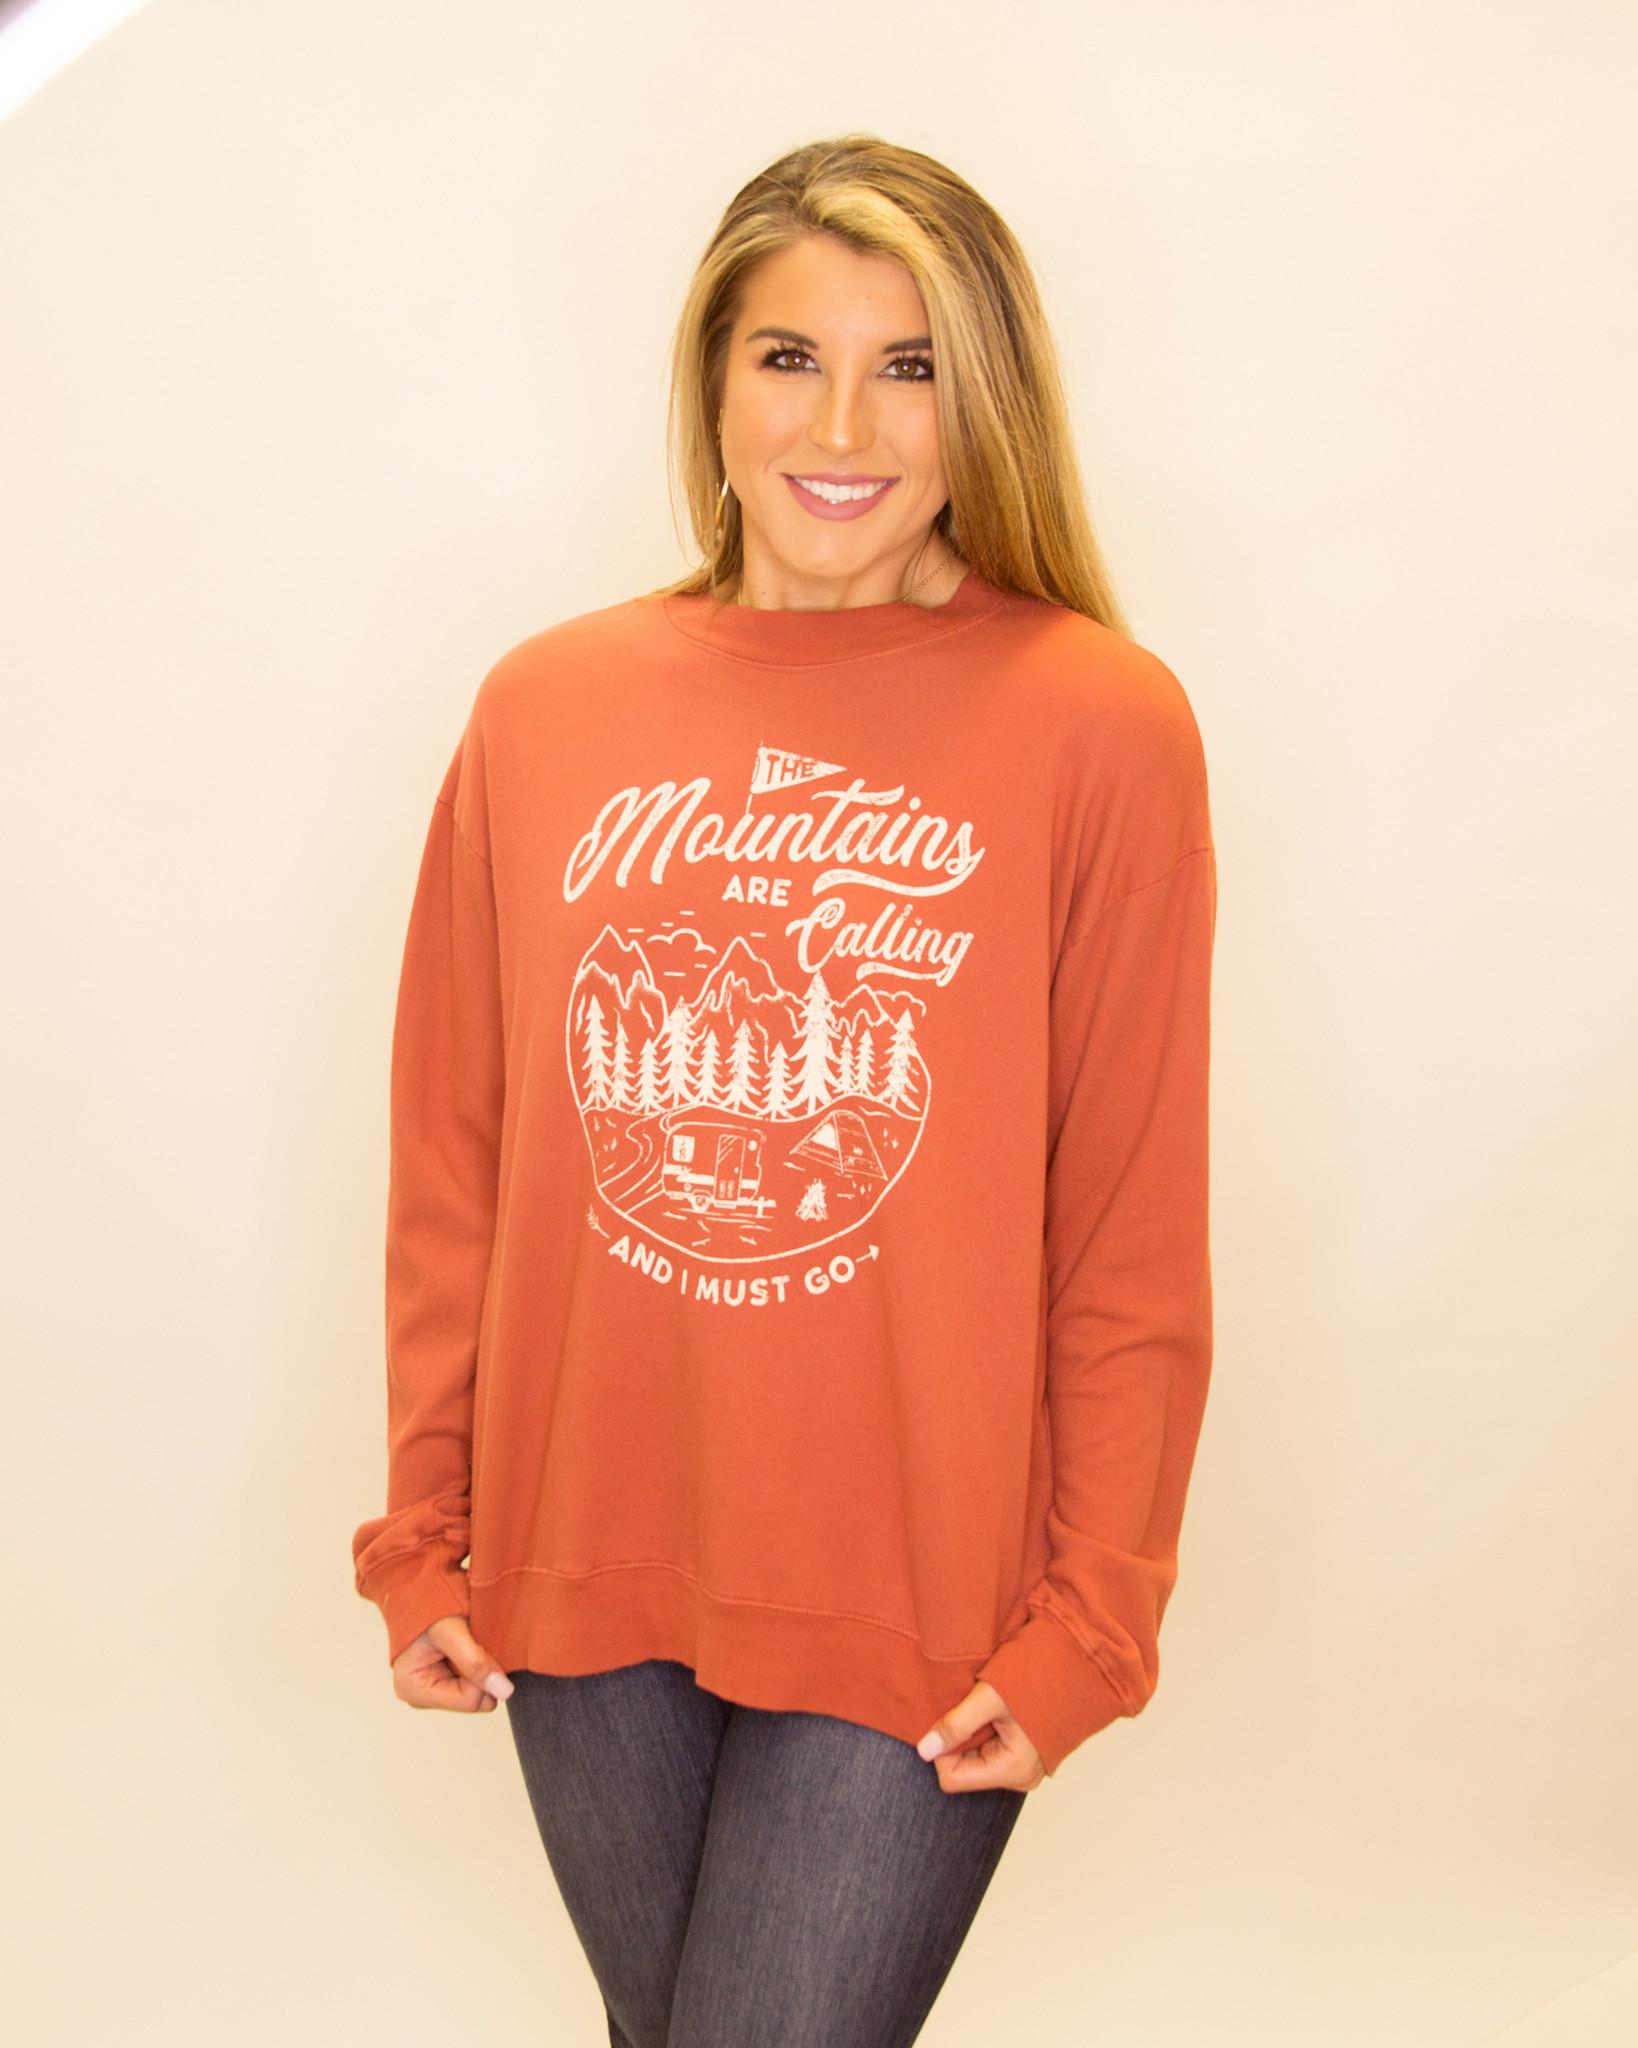 Vintage Garment Washed Graphic Oversized Sweatshirt